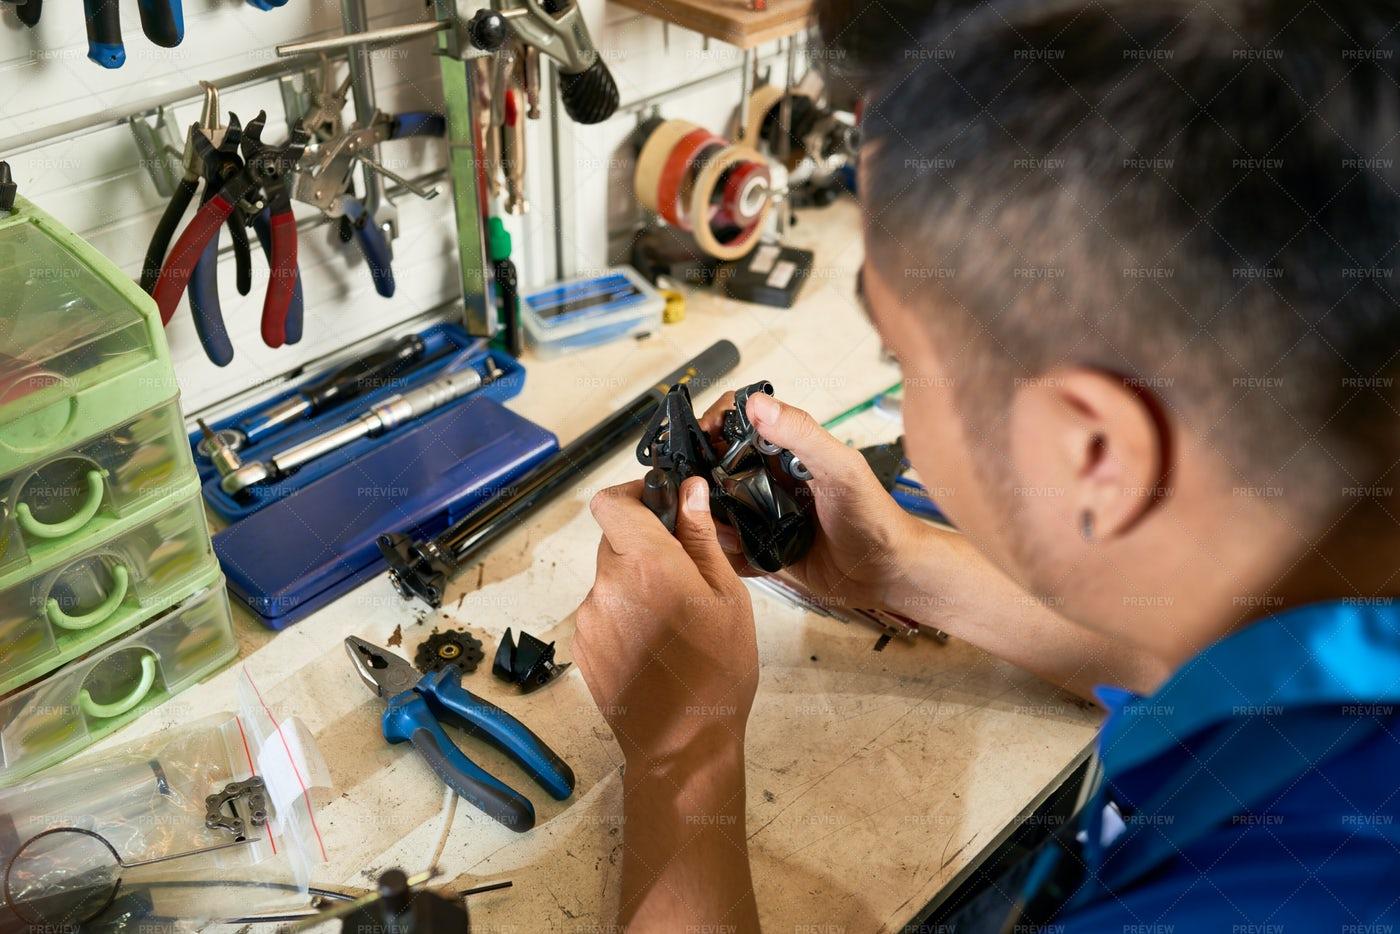 Man Working In Workshop: Stock Photos